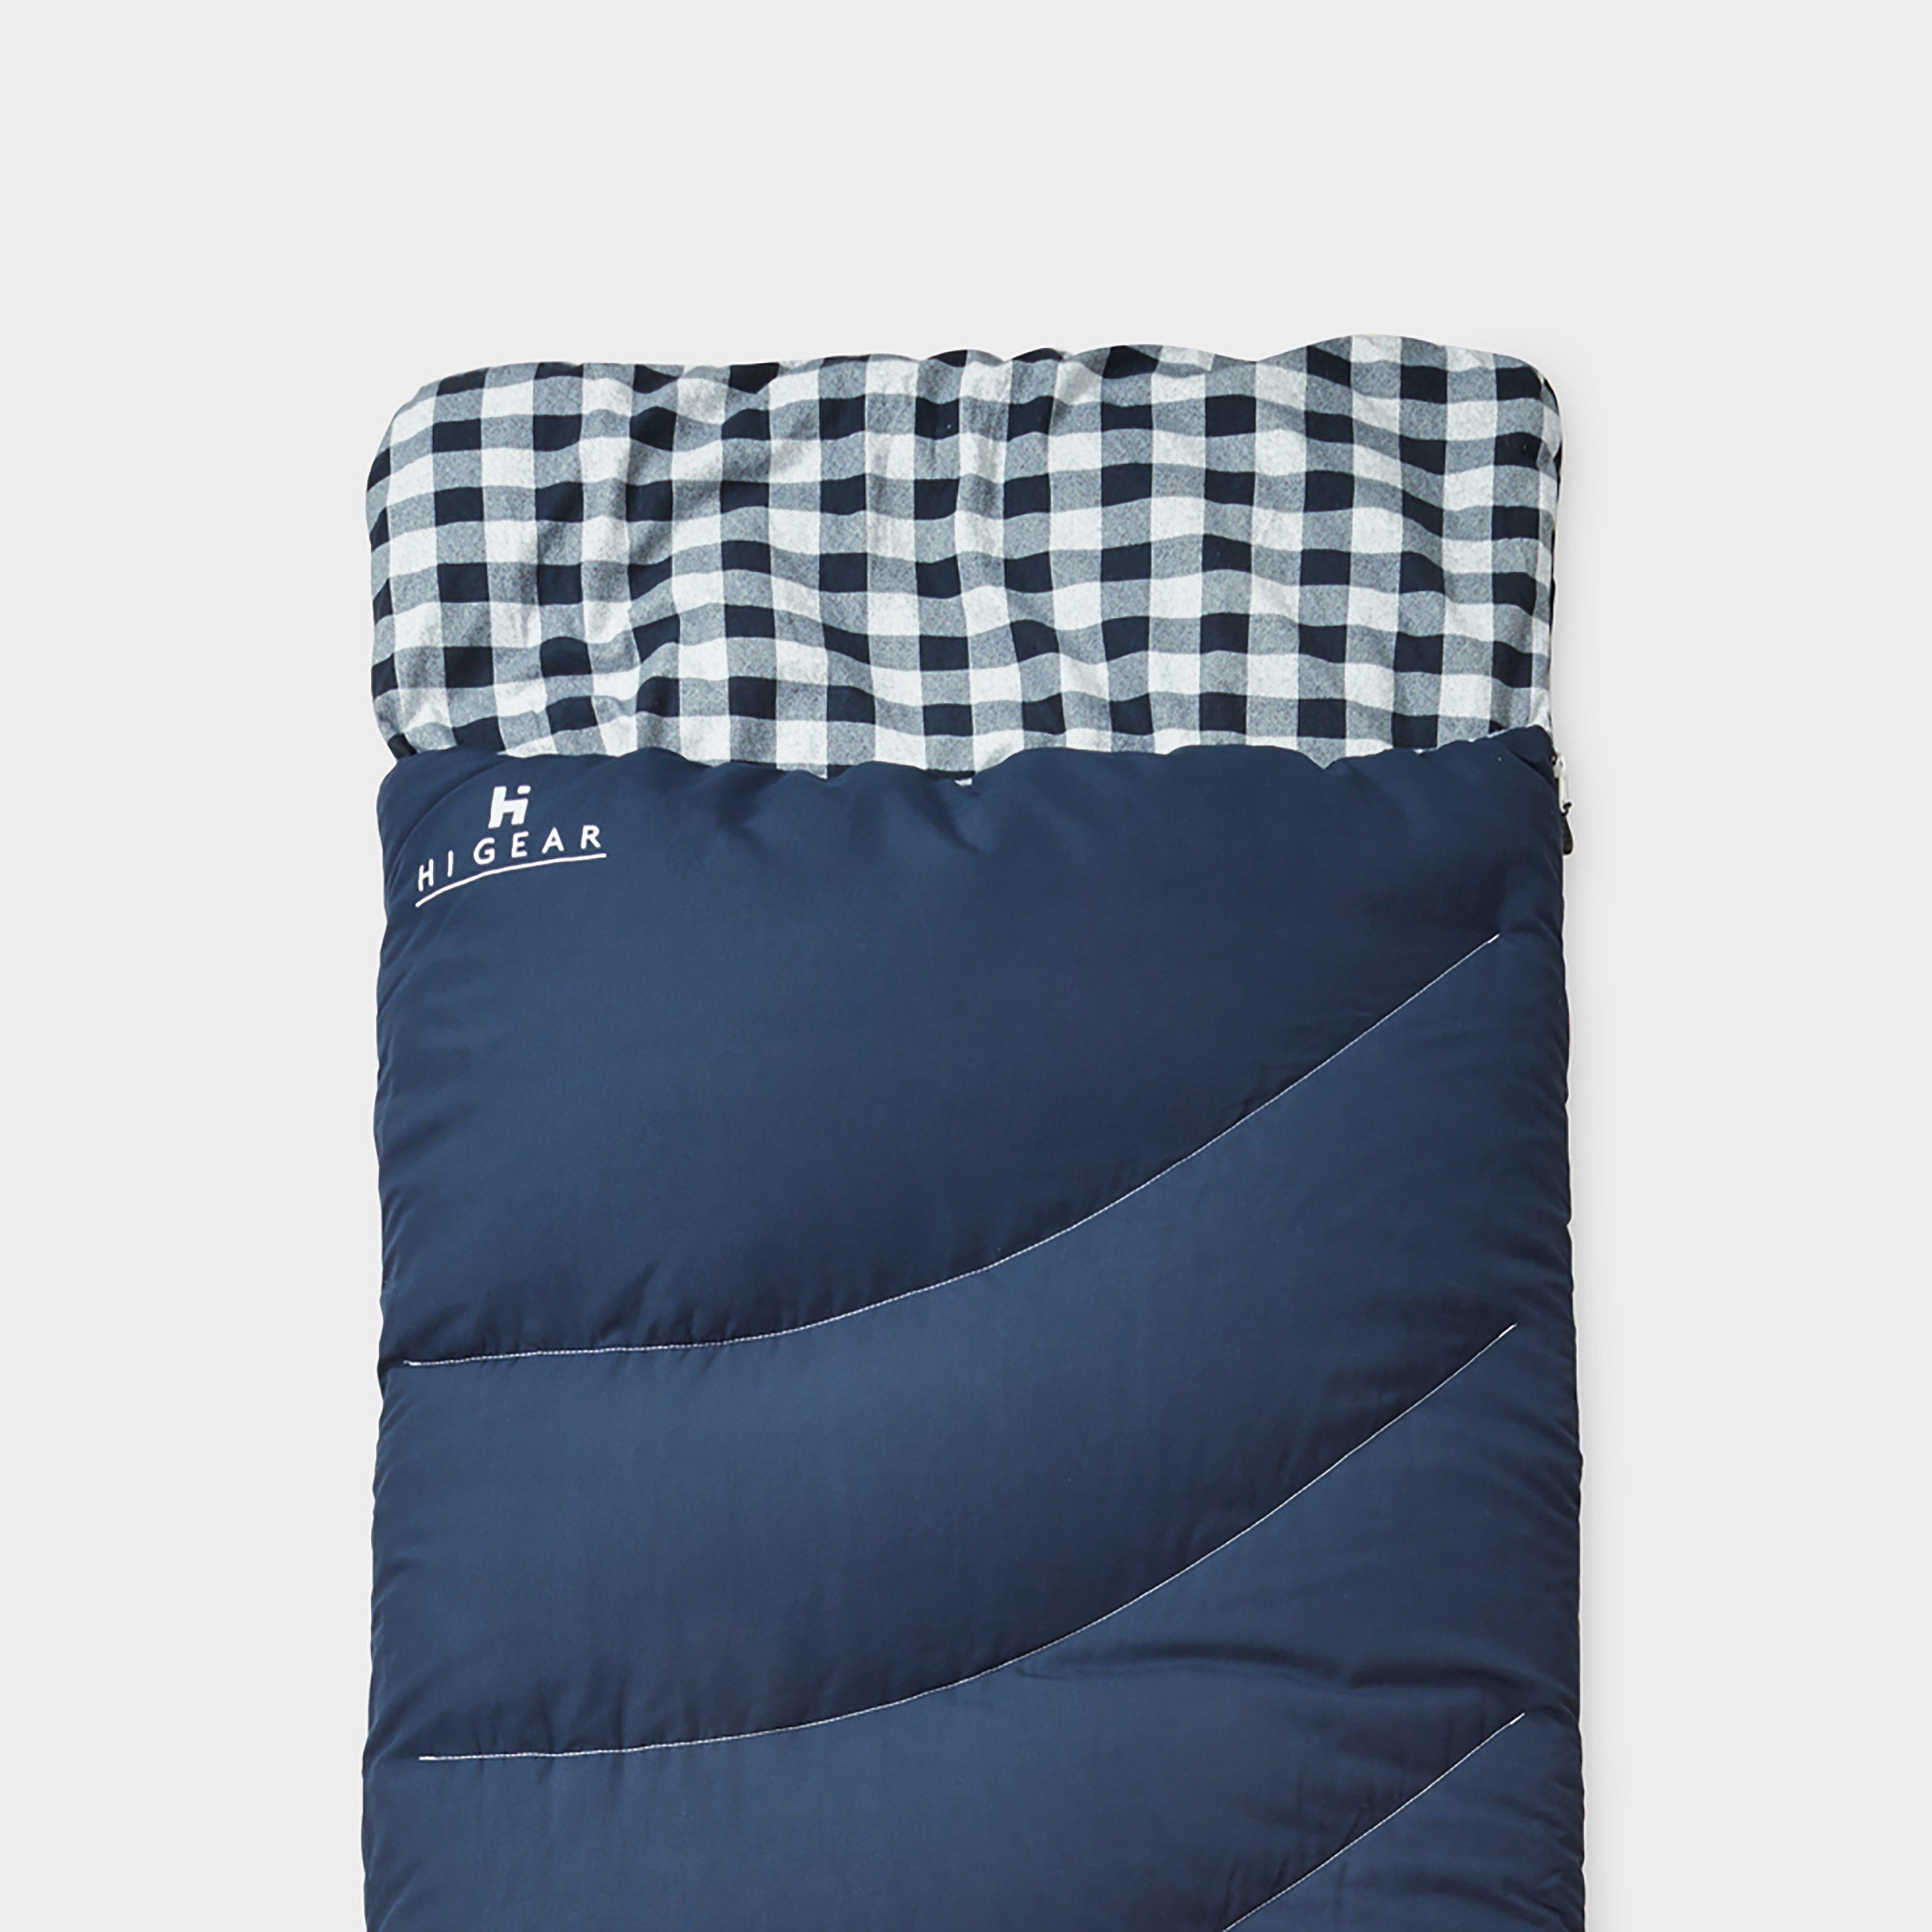 Hi Gear Composure Single Sleeping Bag